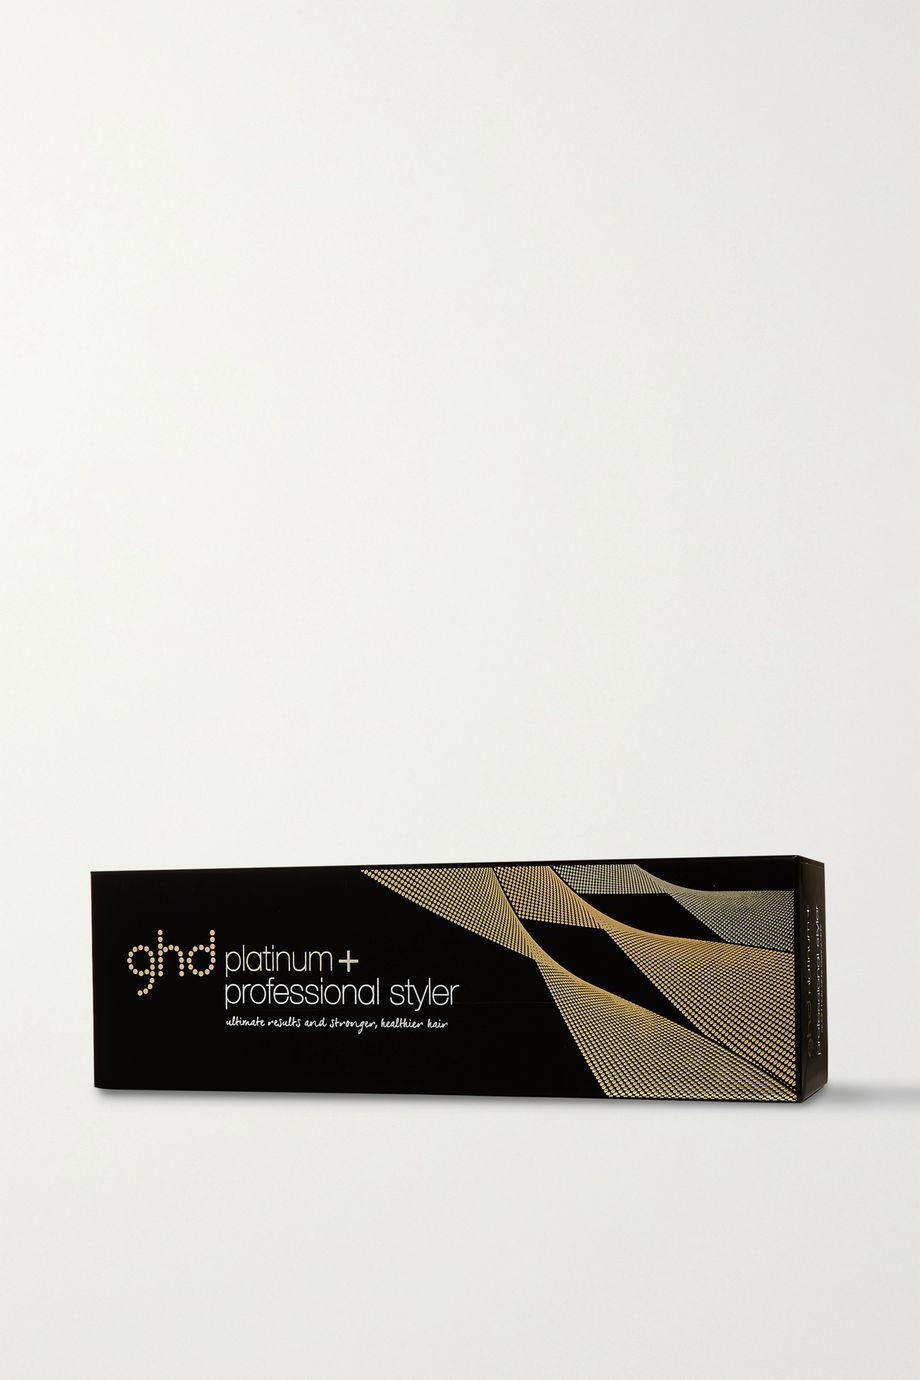 ghd Platinum+ Professional Styler - UK 3-pin plug